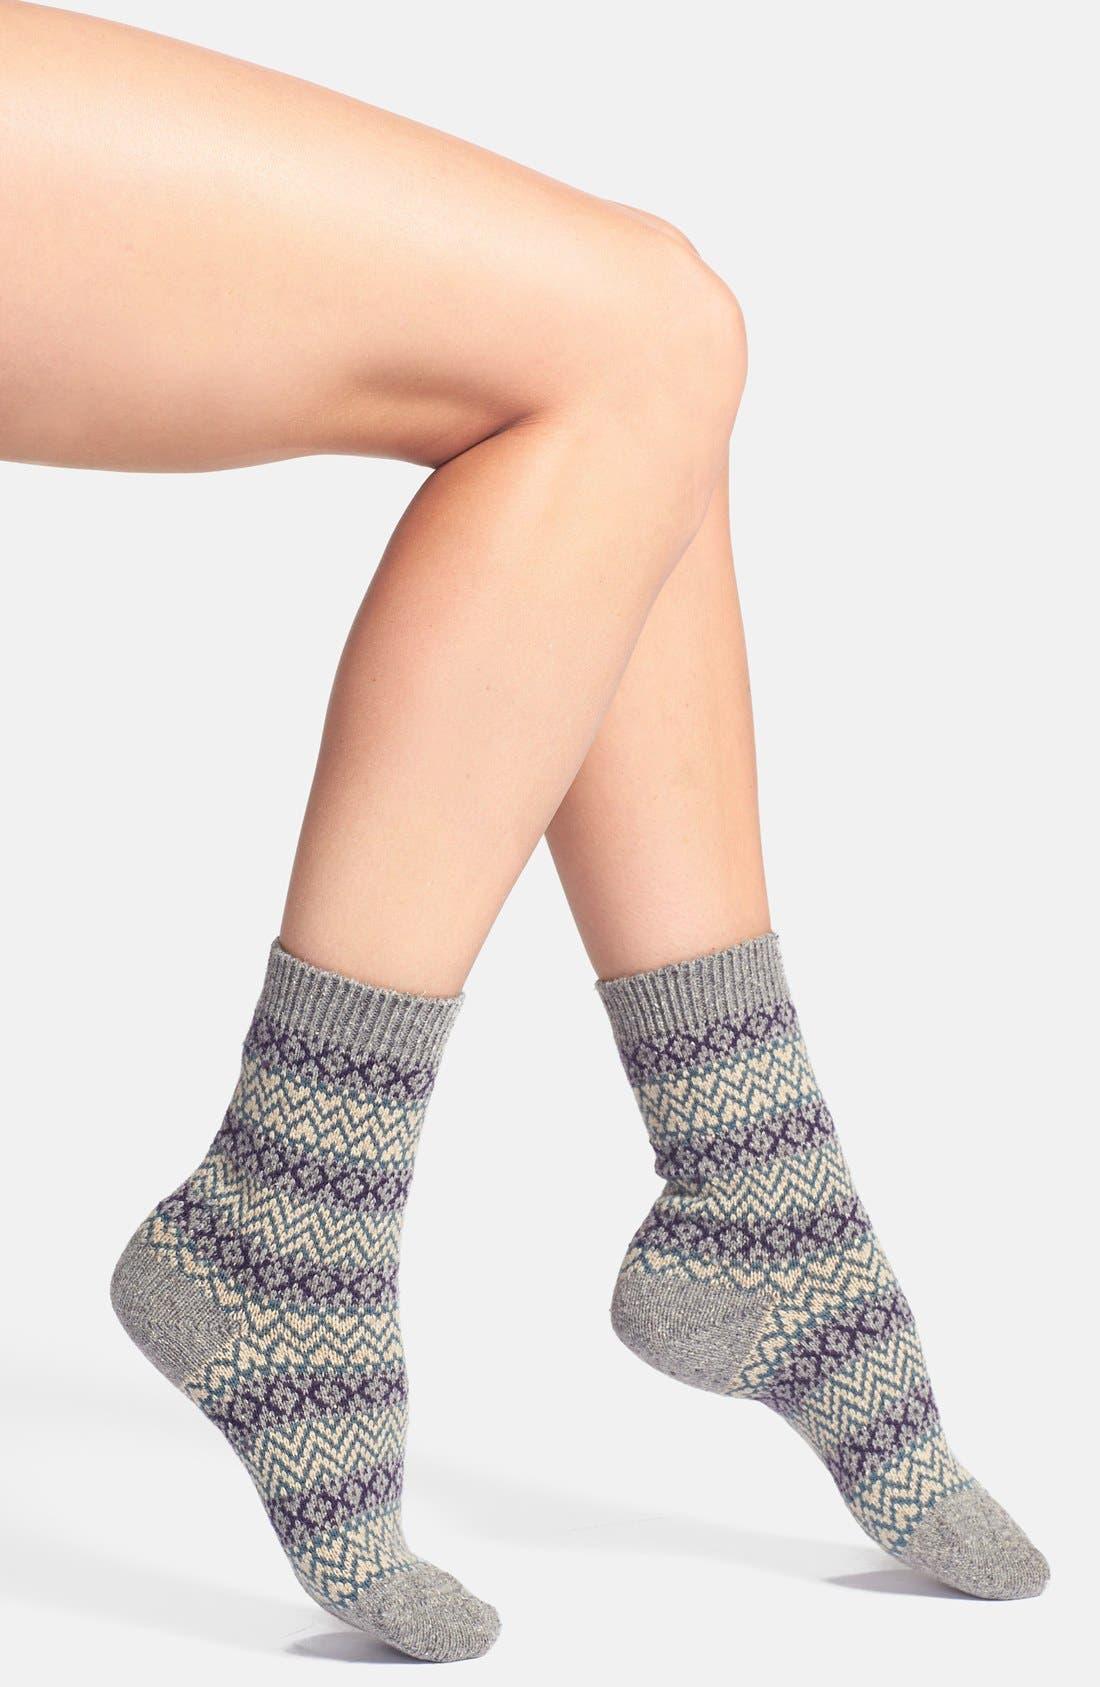 Scott-Nichol 'Rosedale Fair Isle' Wool Blend Socks,                             Main thumbnail 1, color,                             026